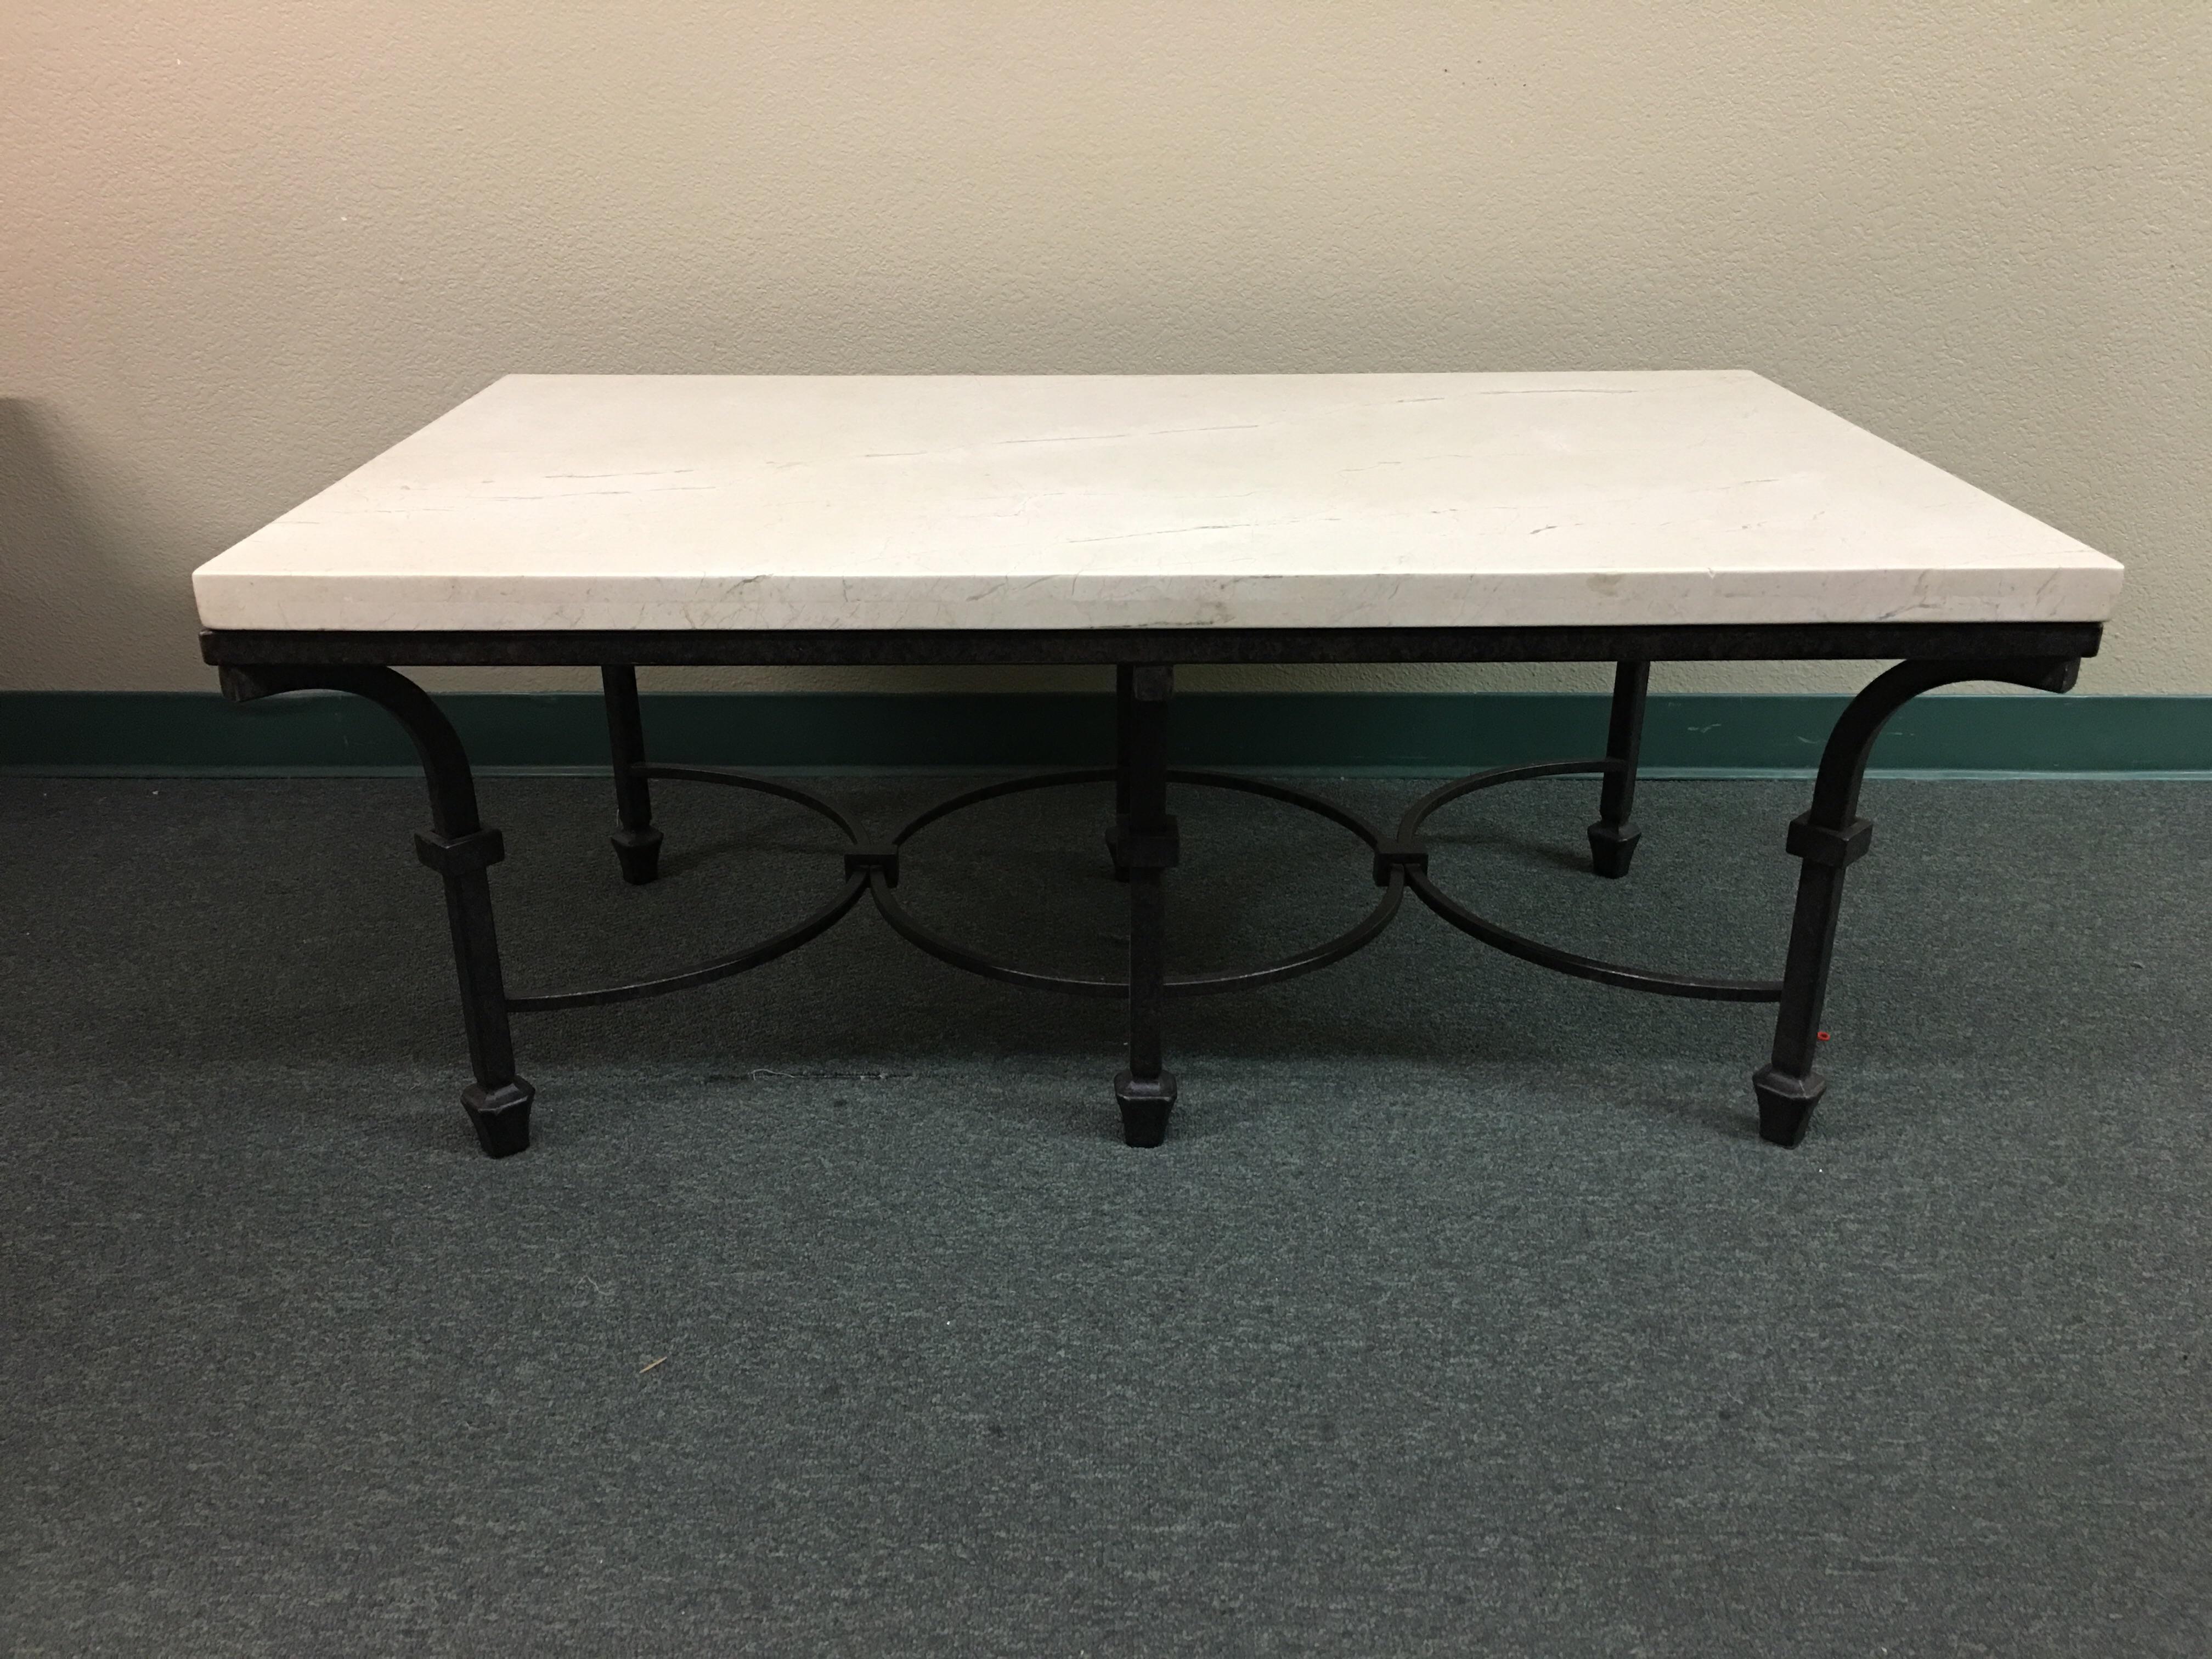 Kolkka Furniture Wrought Iron & Marble Coffee Table